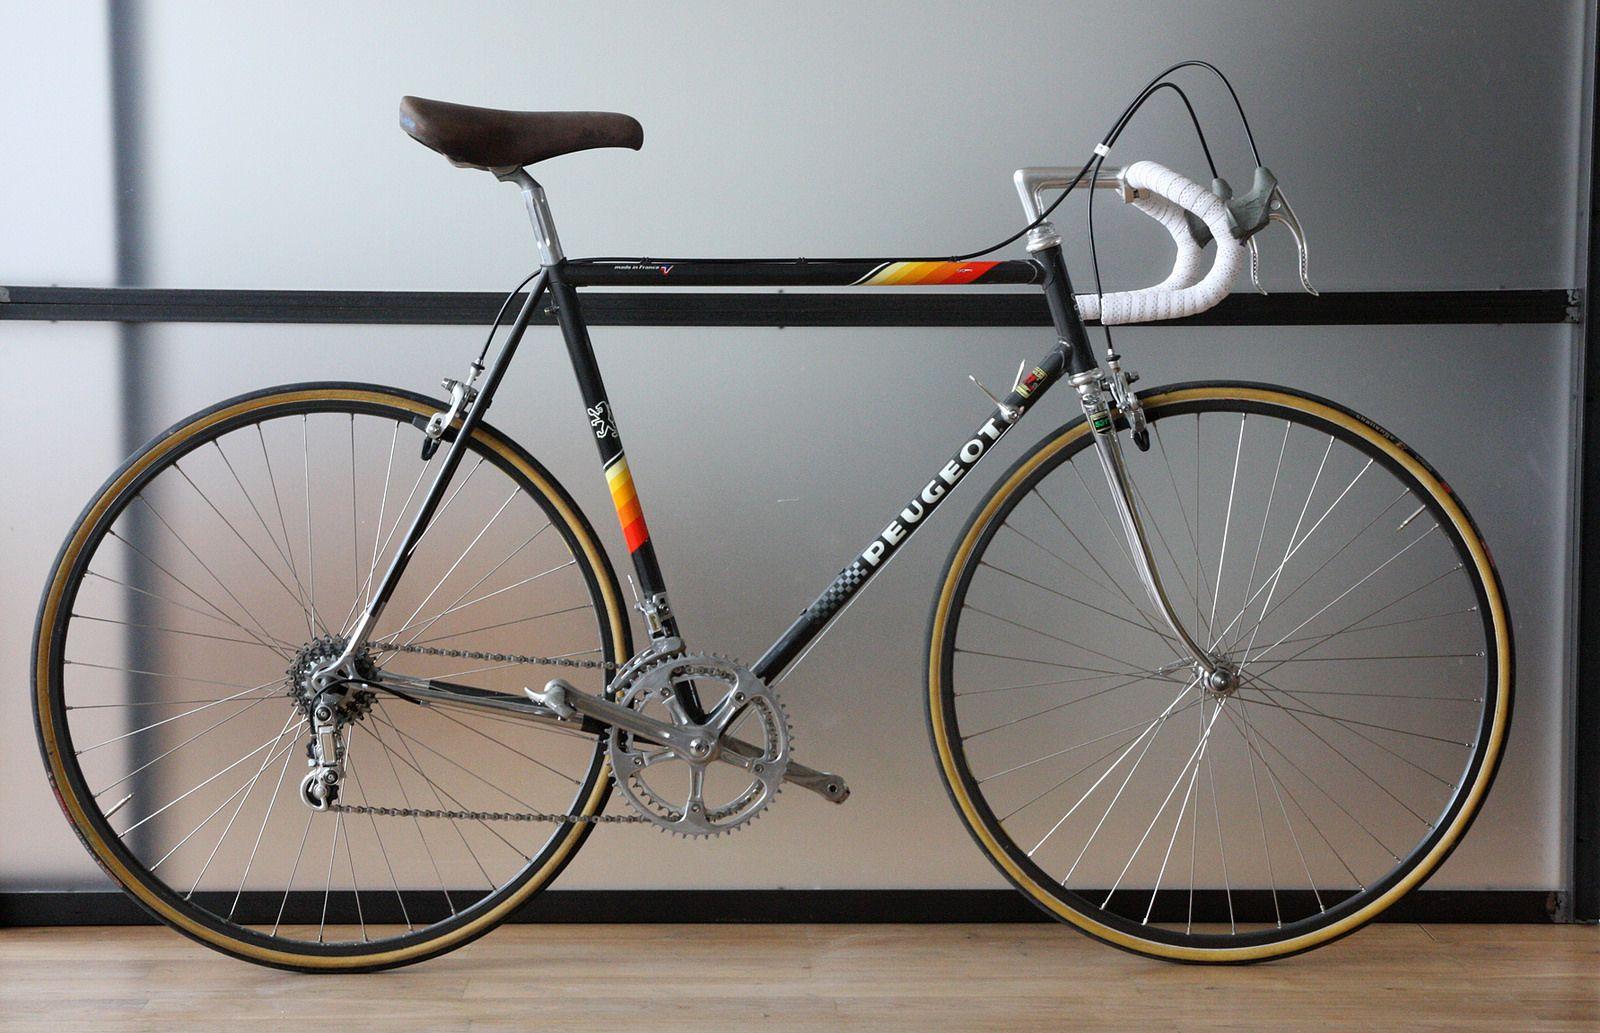 Peugeot Py 10 Ls From 1984 Peugeot Bike Road Bike Vintage Bicycle